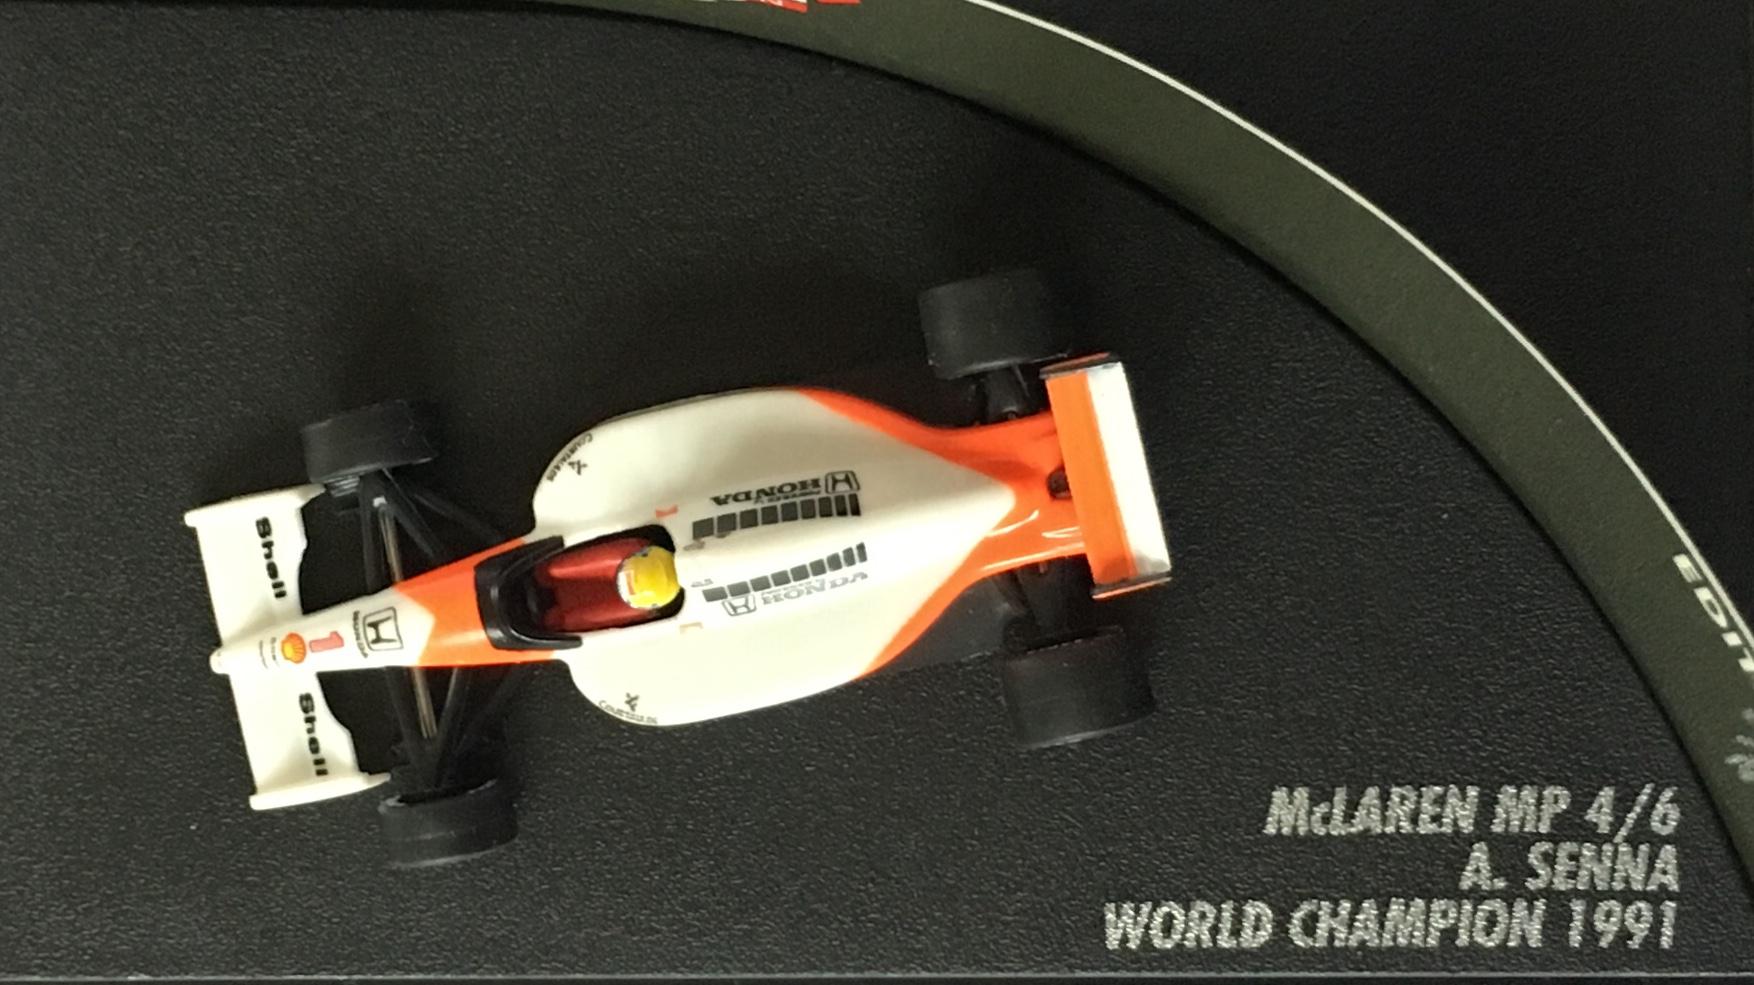 McLaren MP 4-6 Senna 005.jpg